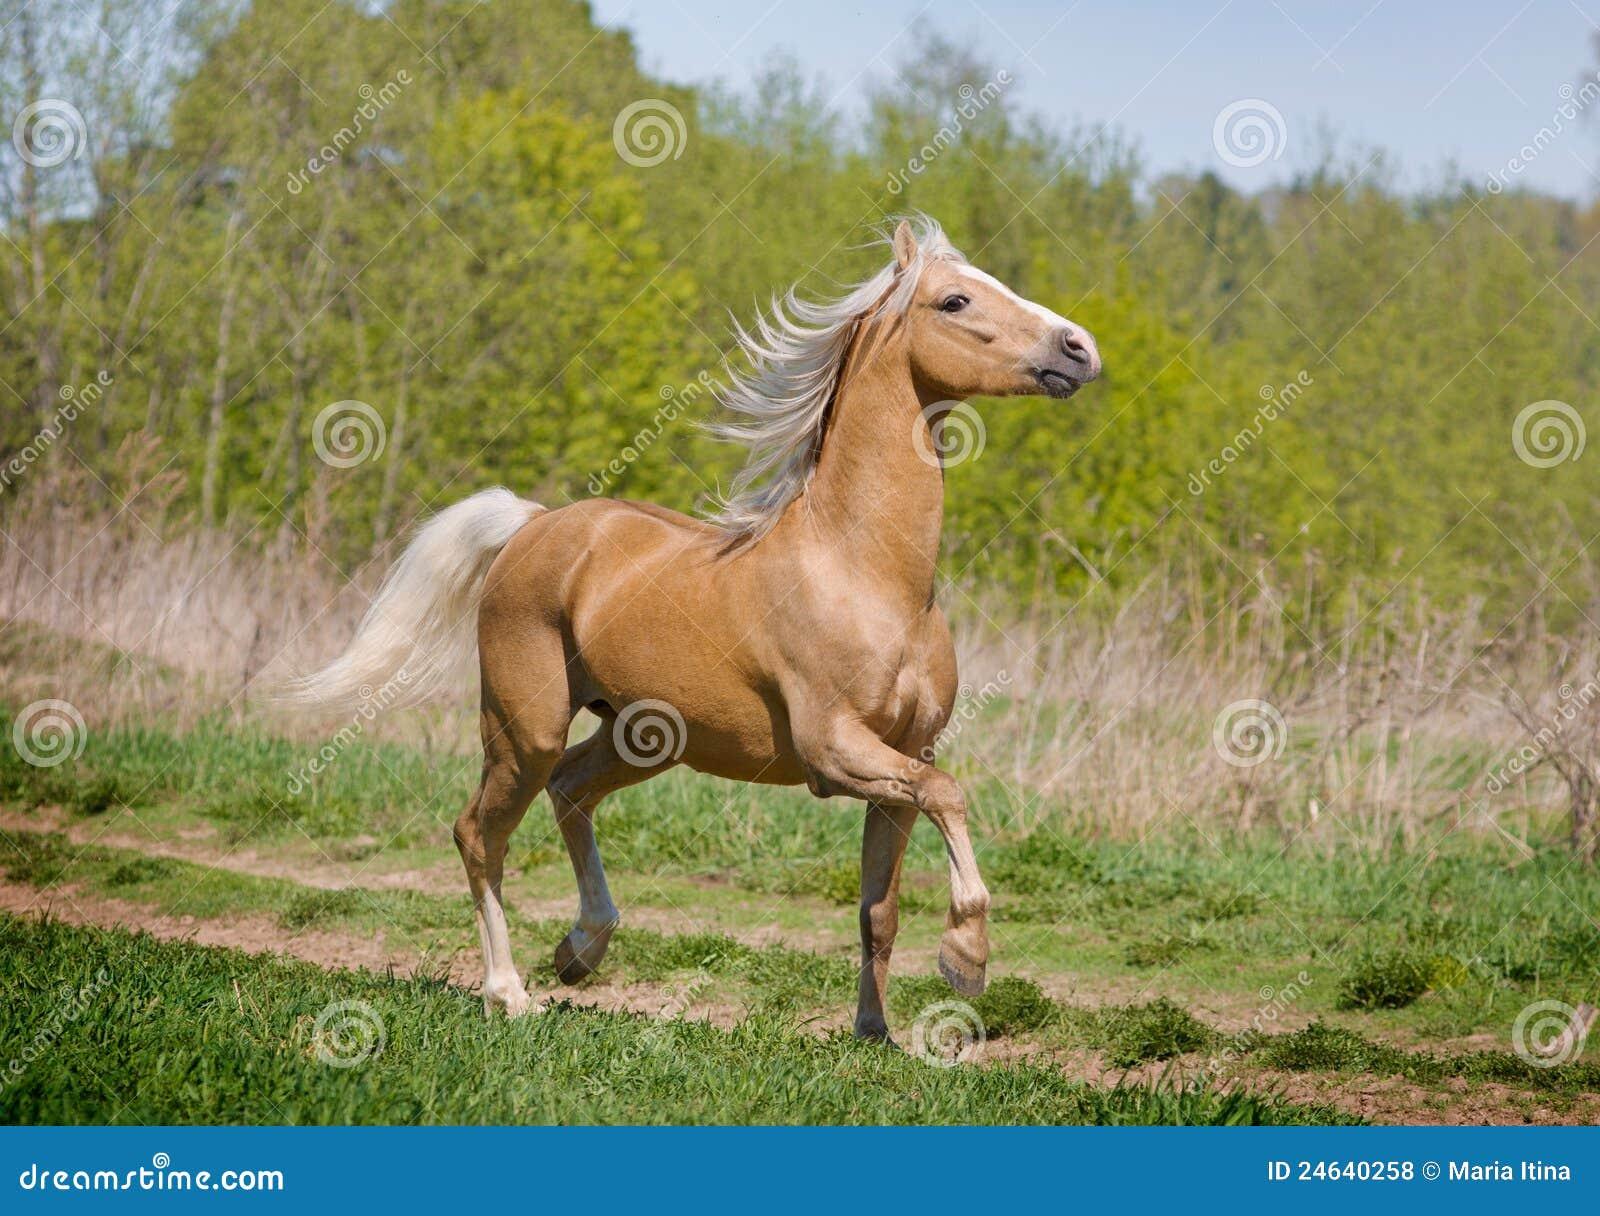 Walking Horse Royalty Free Stock Photos - Image: 24640258